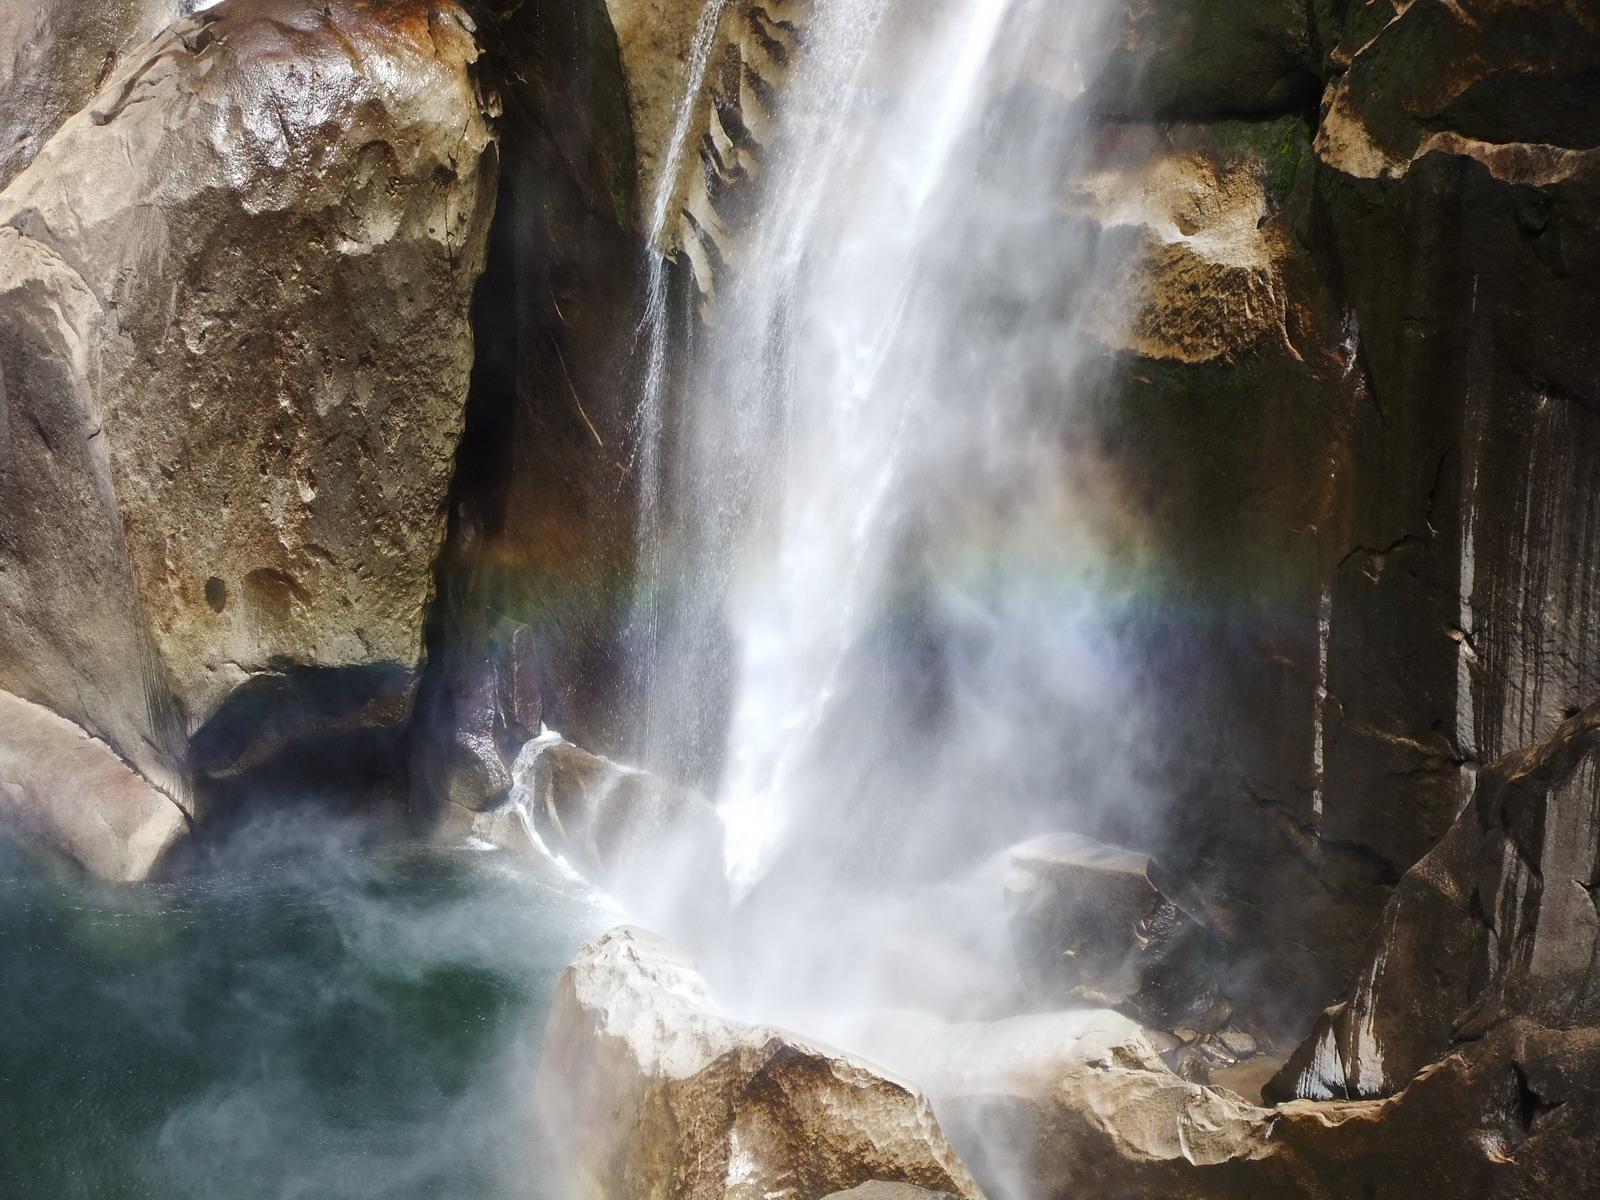 США, Виды Yosemite, водопад Virnal Fall